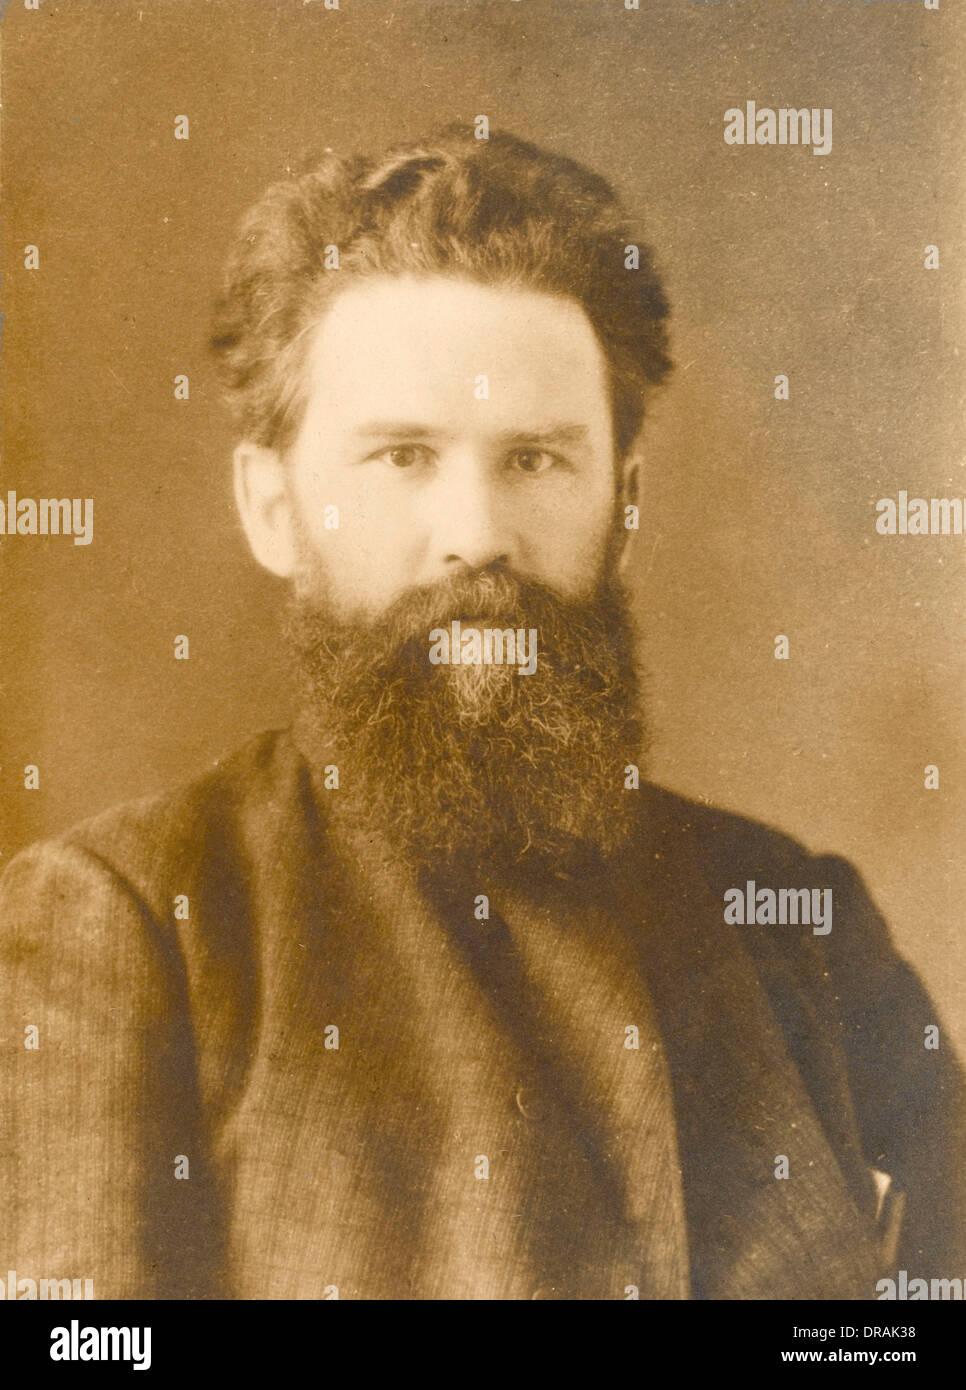 Vladimir Galaktionovich Korolenko - Stock Image